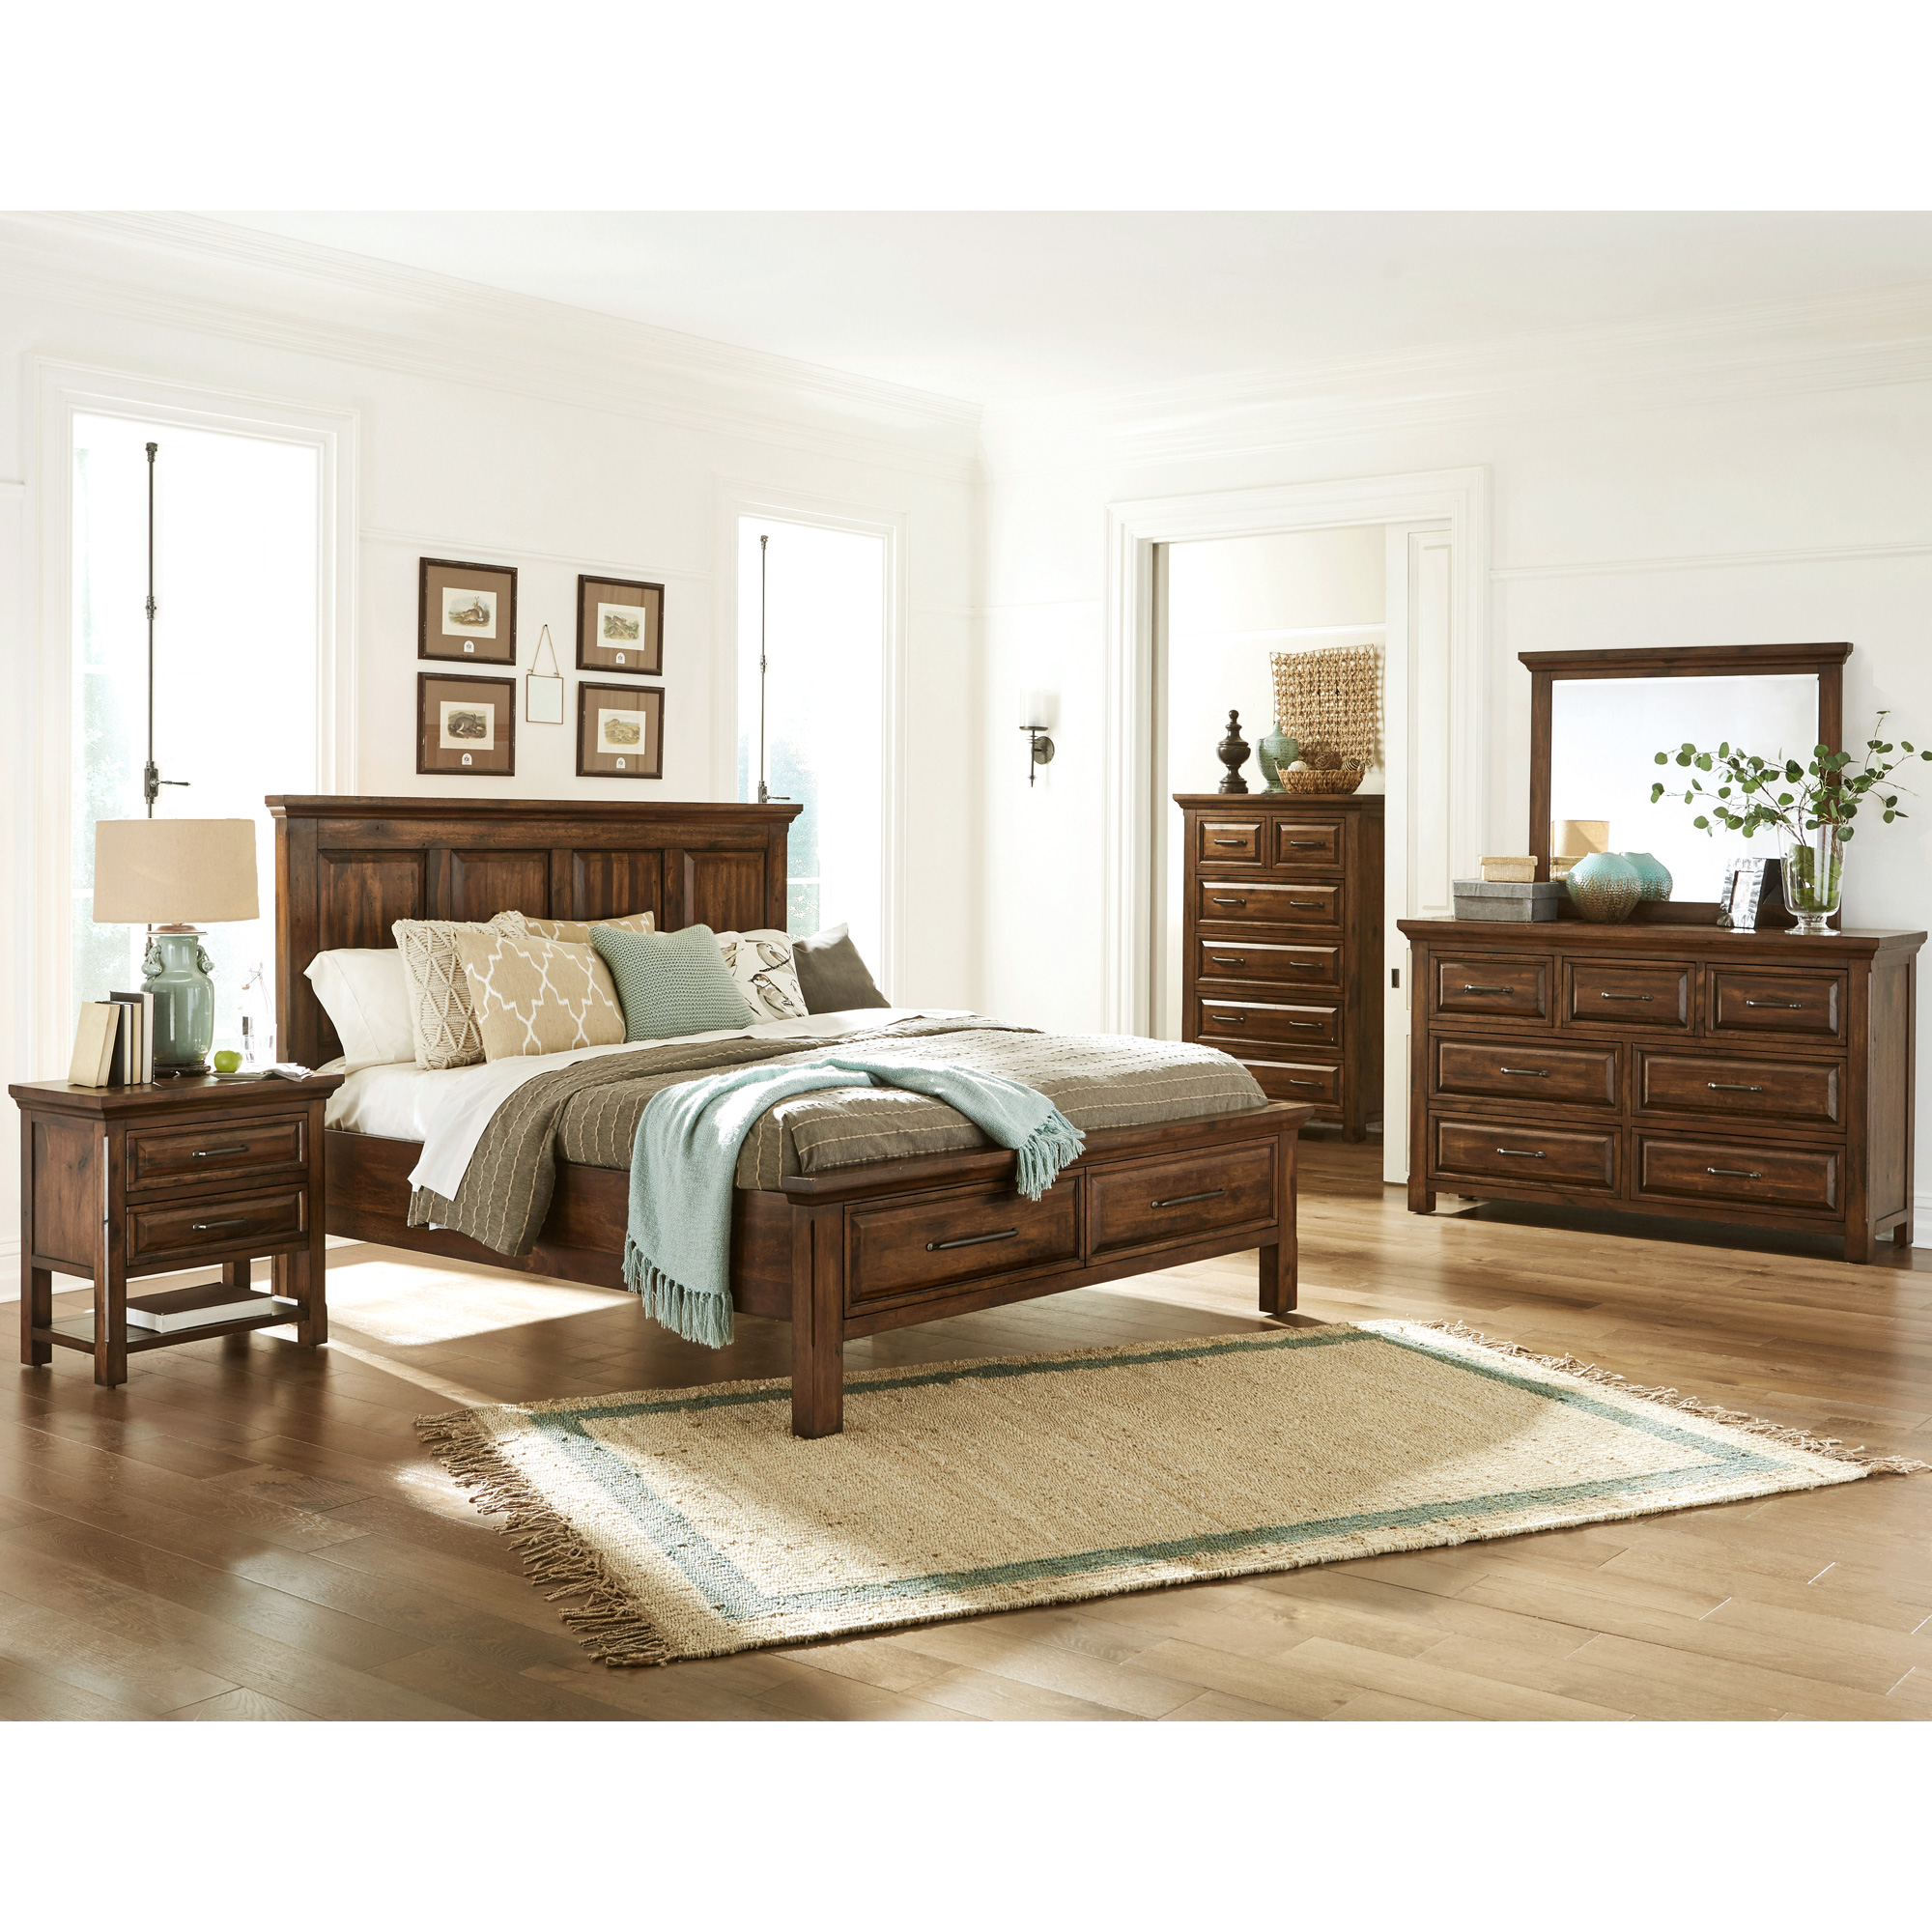 Napa Furniture   Hill Crest Dark Chestnut California King 4 Piece Room Group Bedroom Set